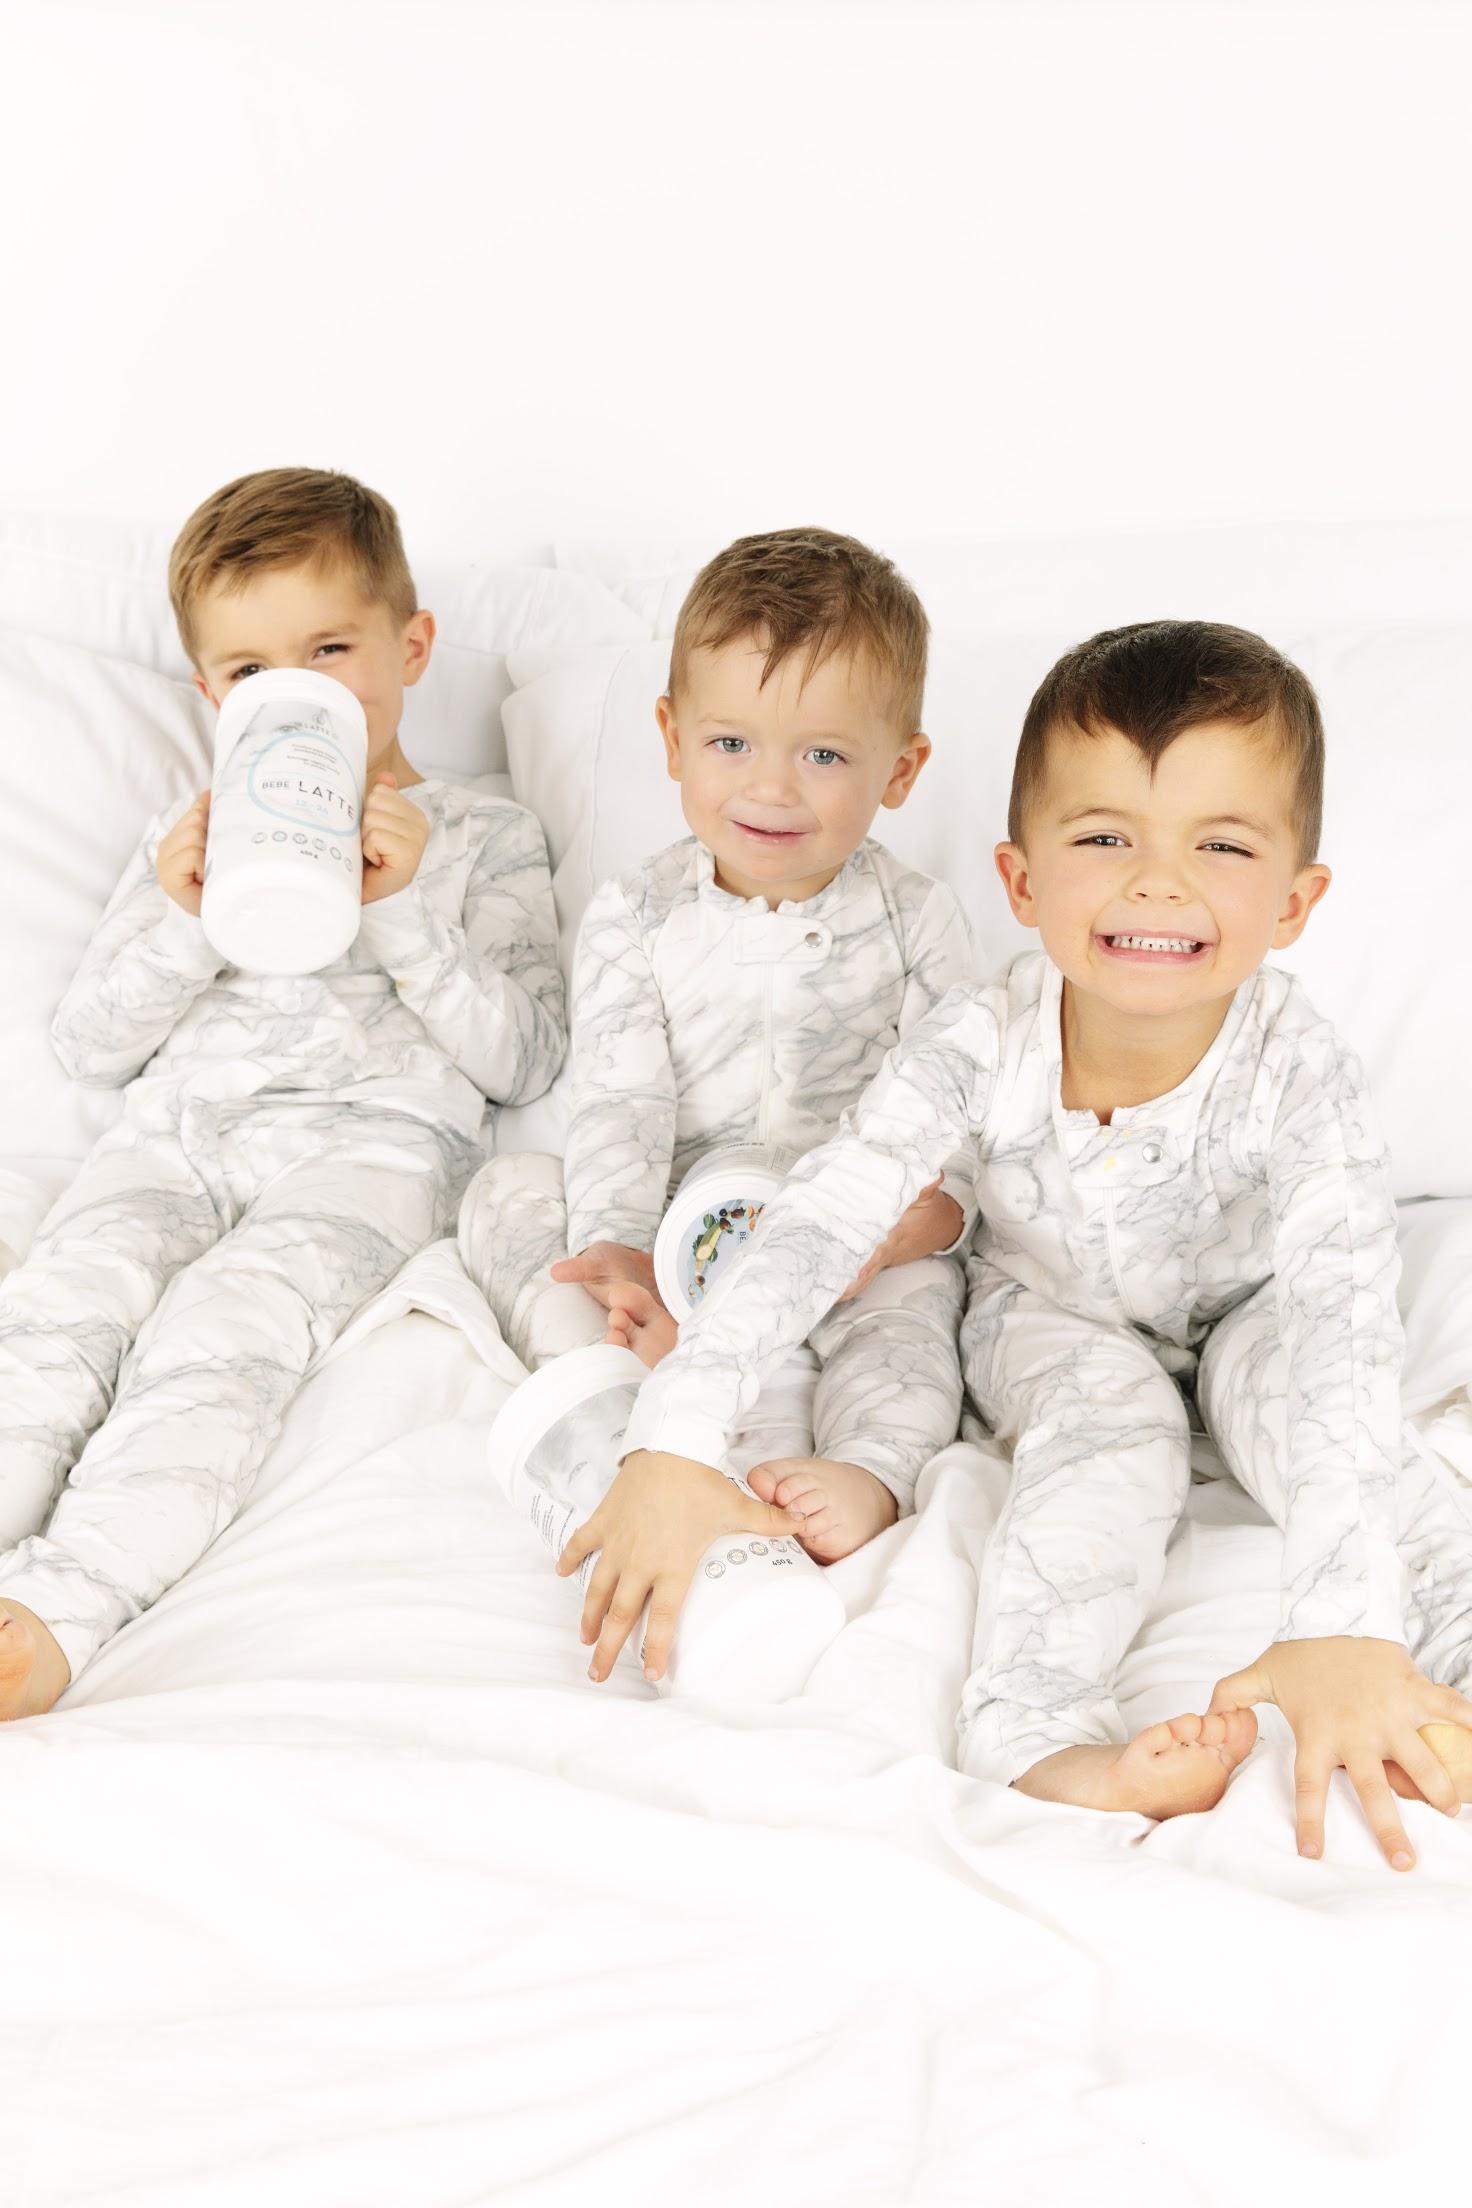 The Pacioretty boys love their mama's LATTE!